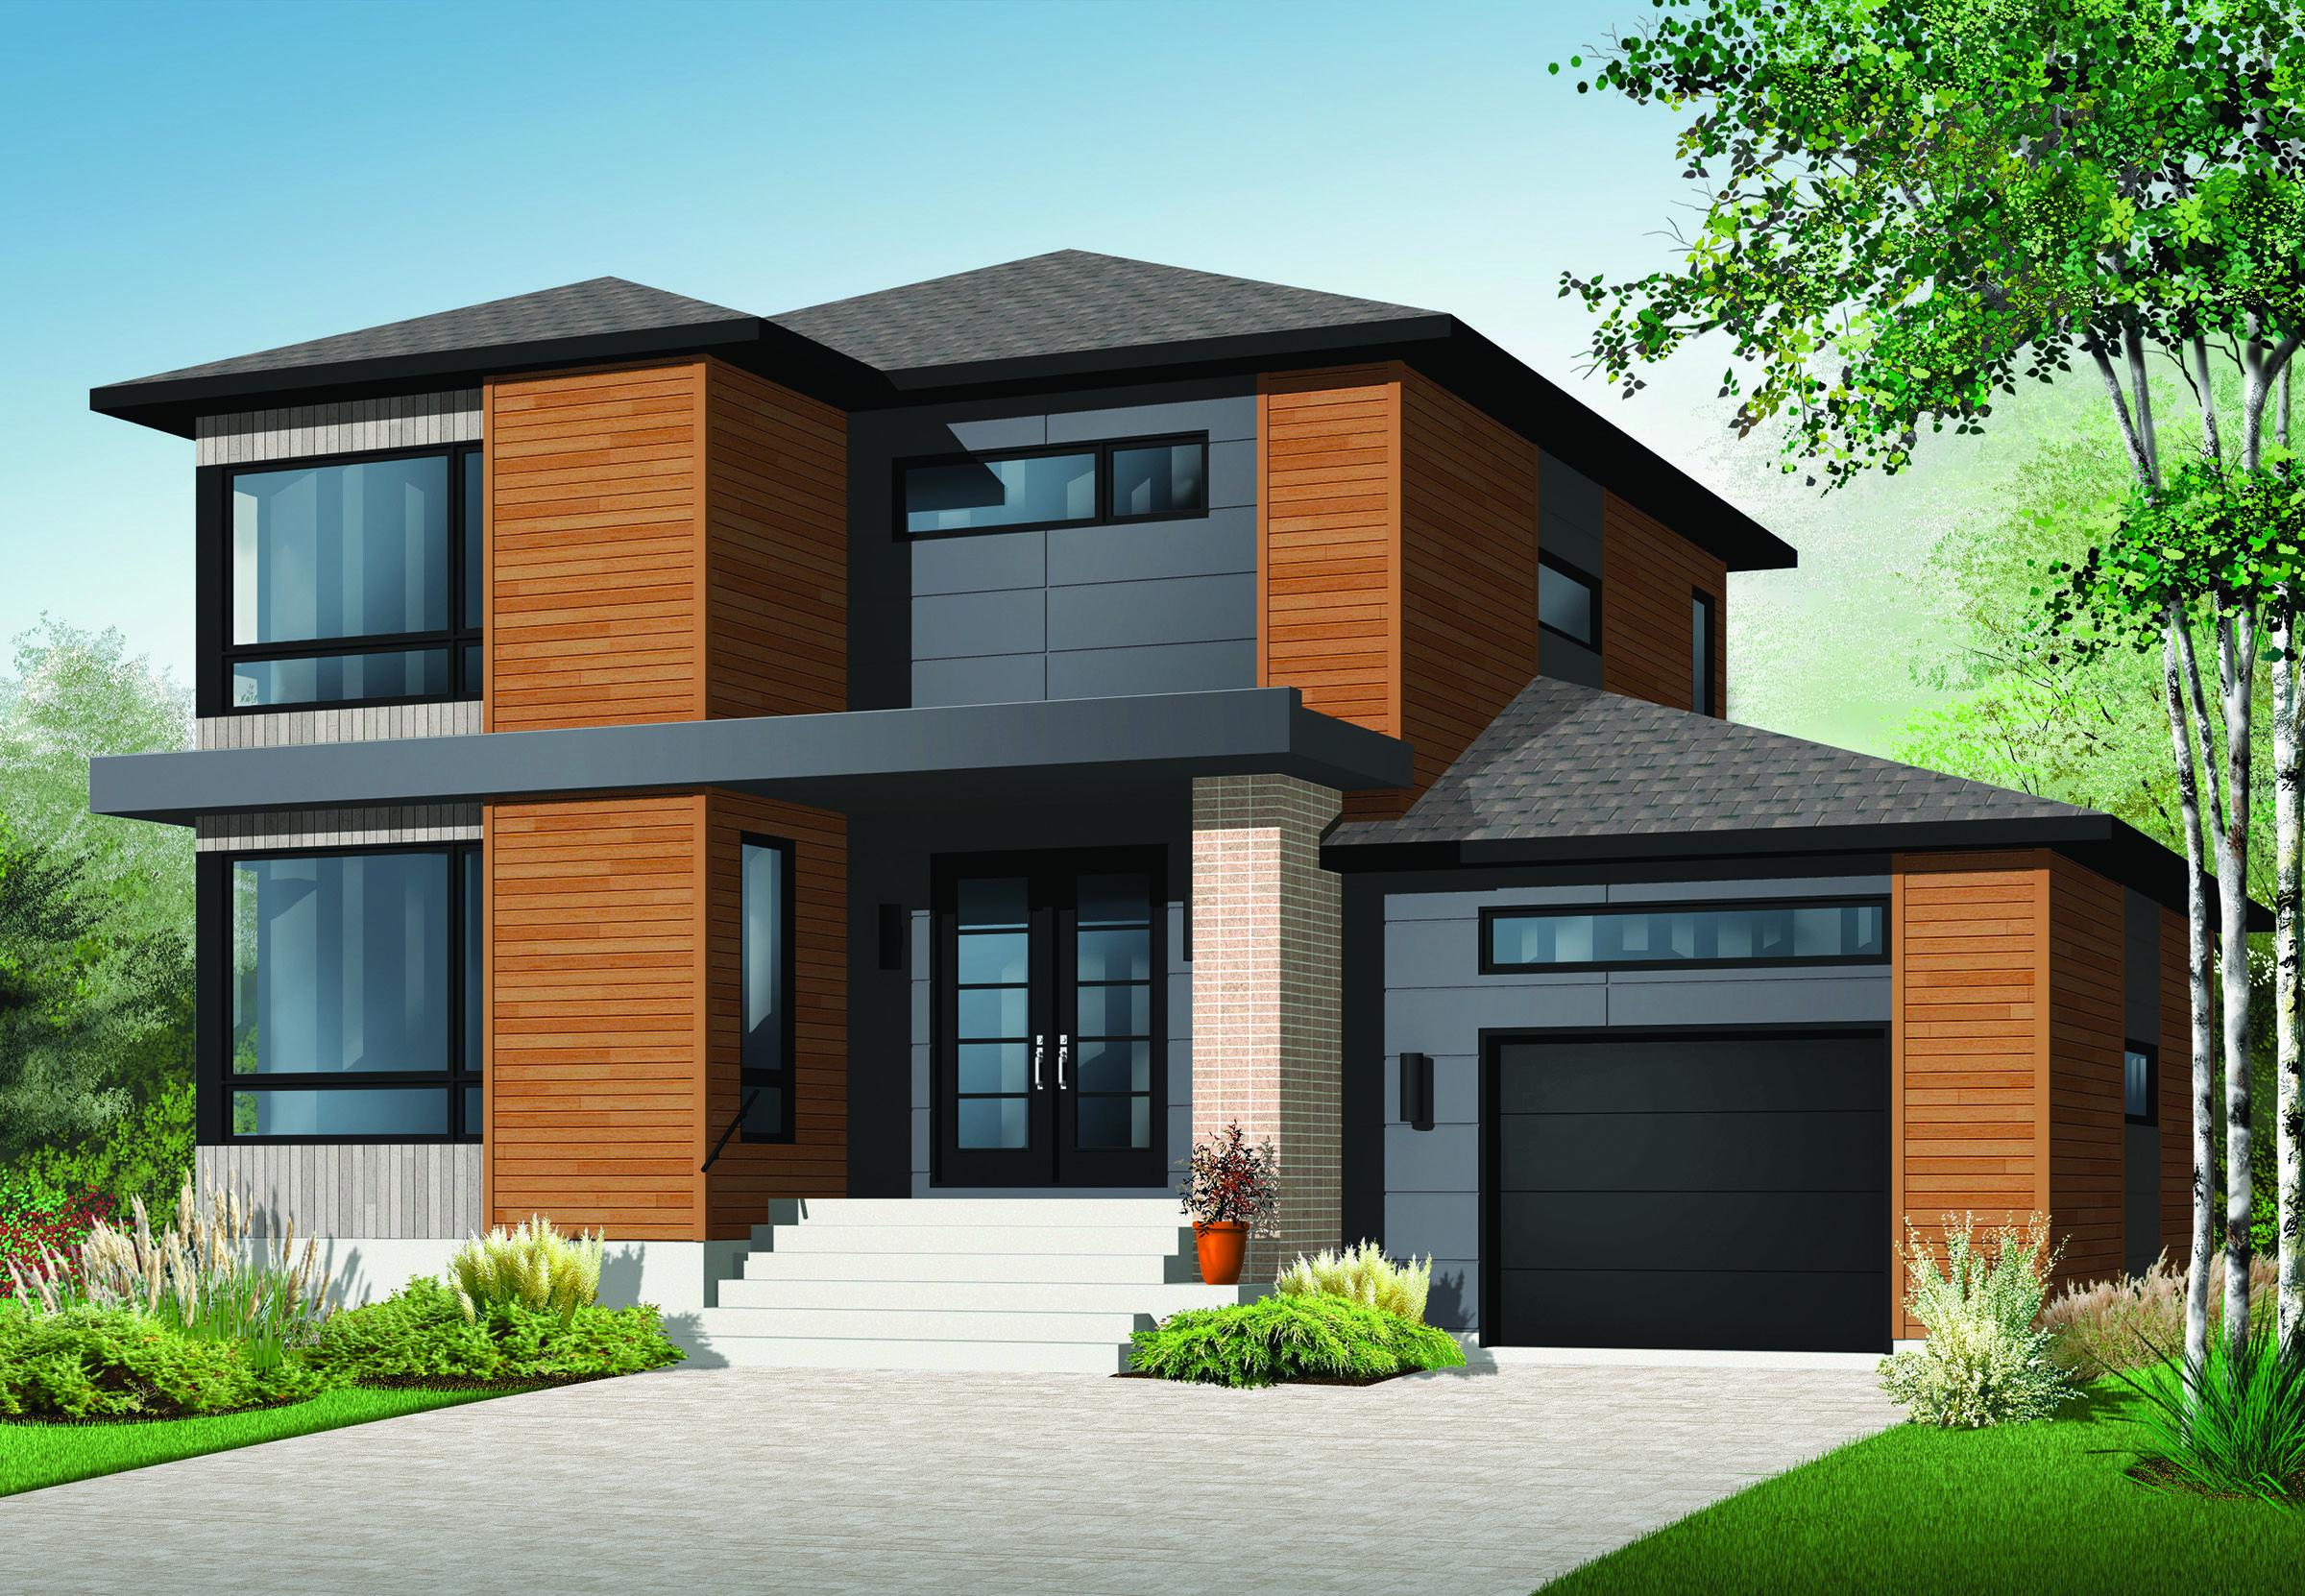 Plan 22322DR Stately Modern with Garage 2 storey house